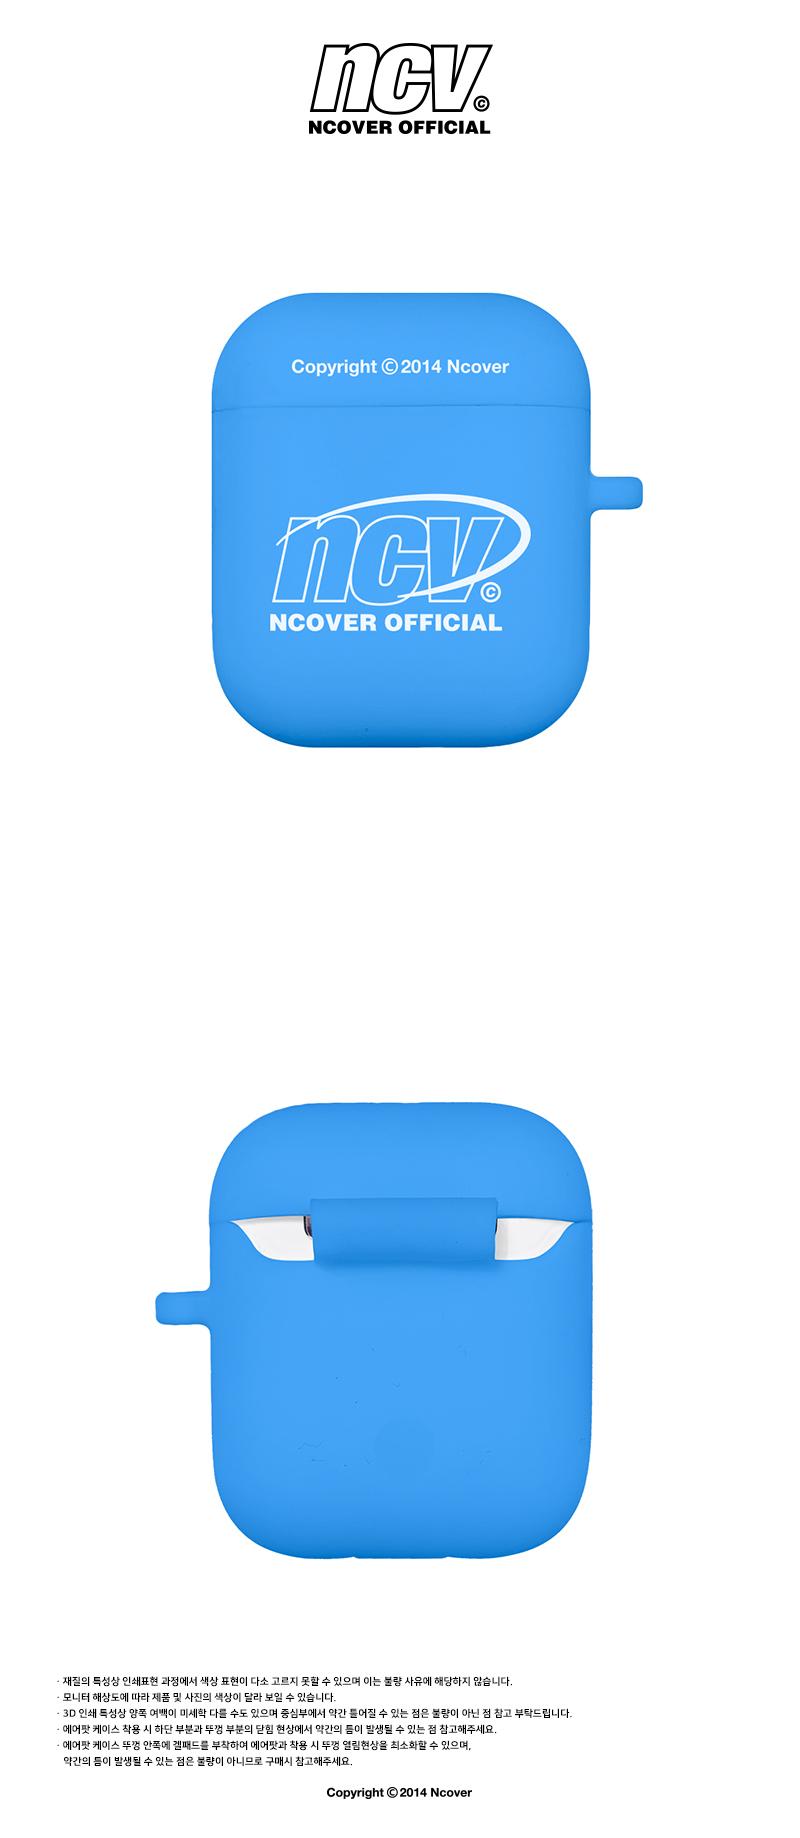 Quarter ellipse logo case-blue(airpods case).jpg